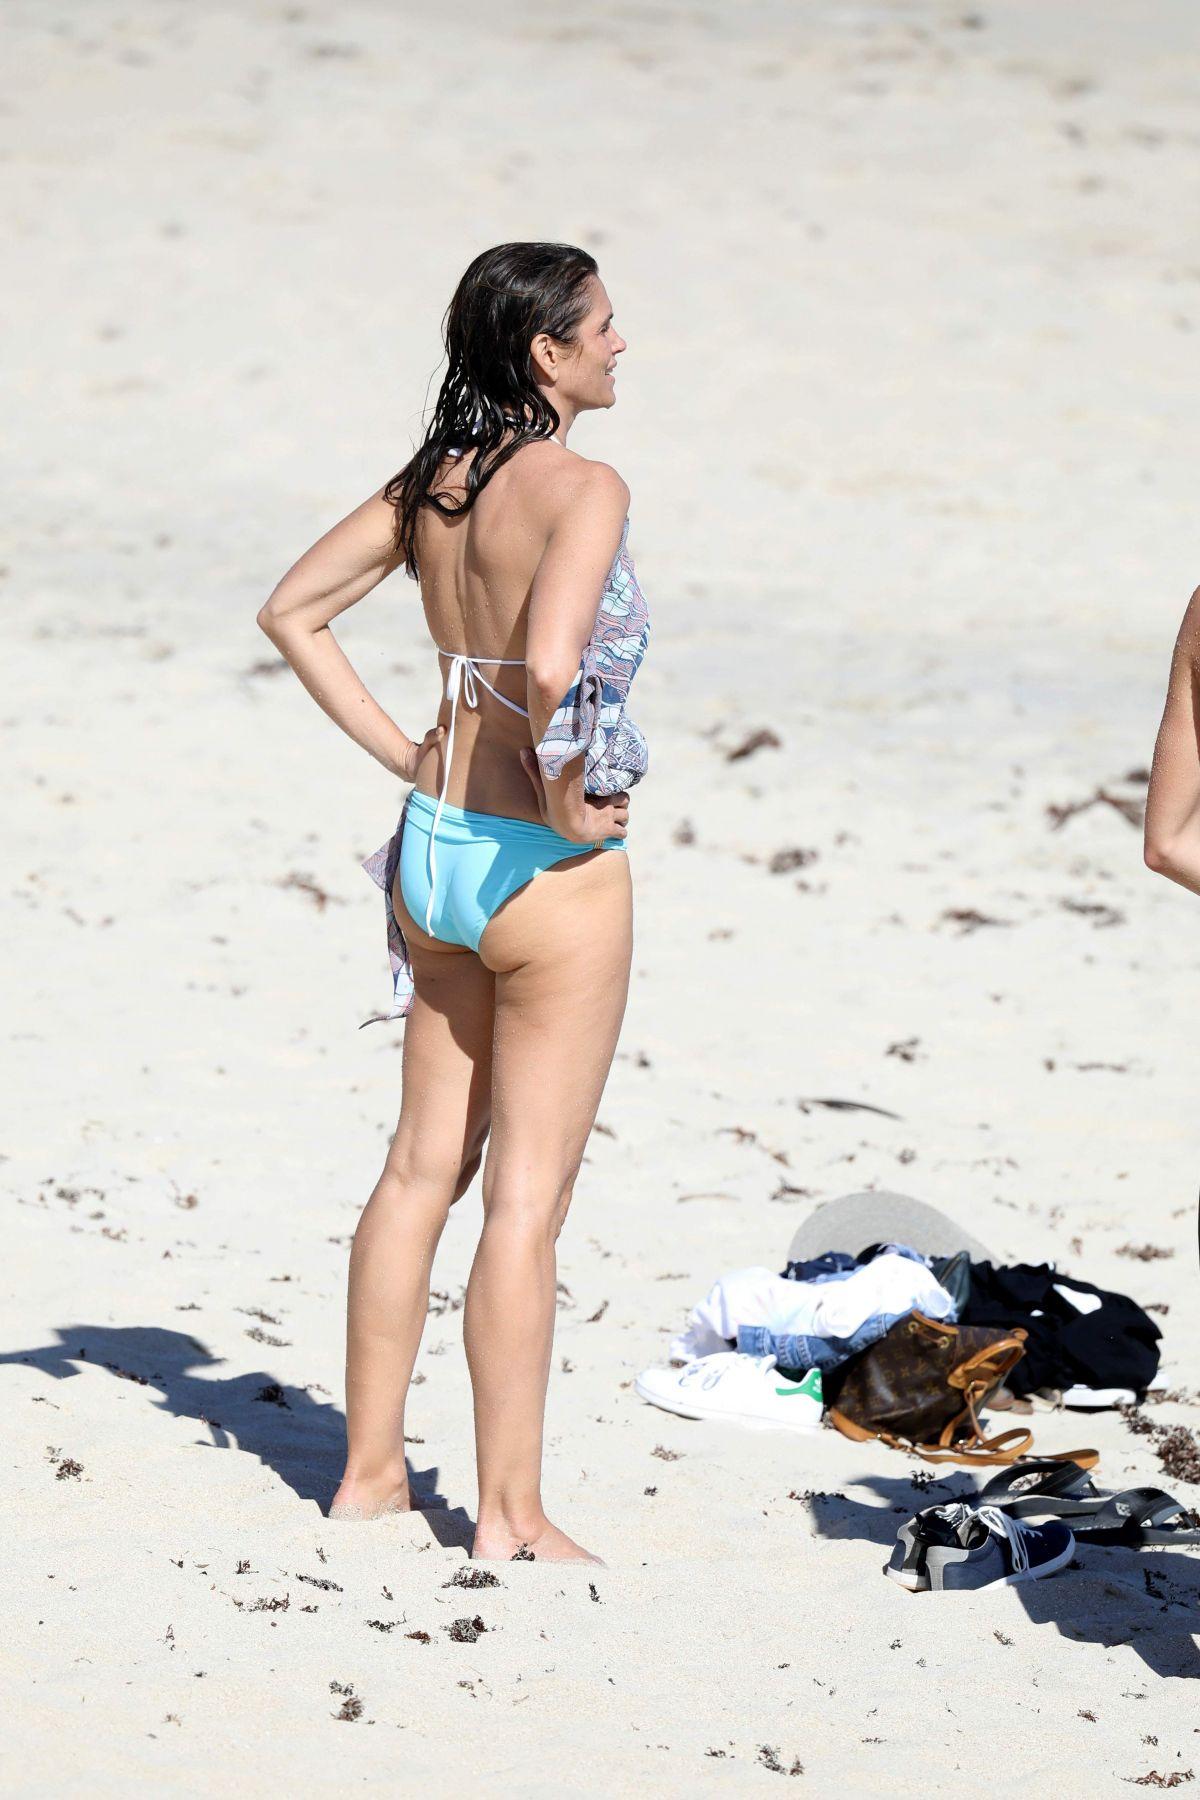 Cindy Crawford In Bikini On The Beach In St Barth 04 07